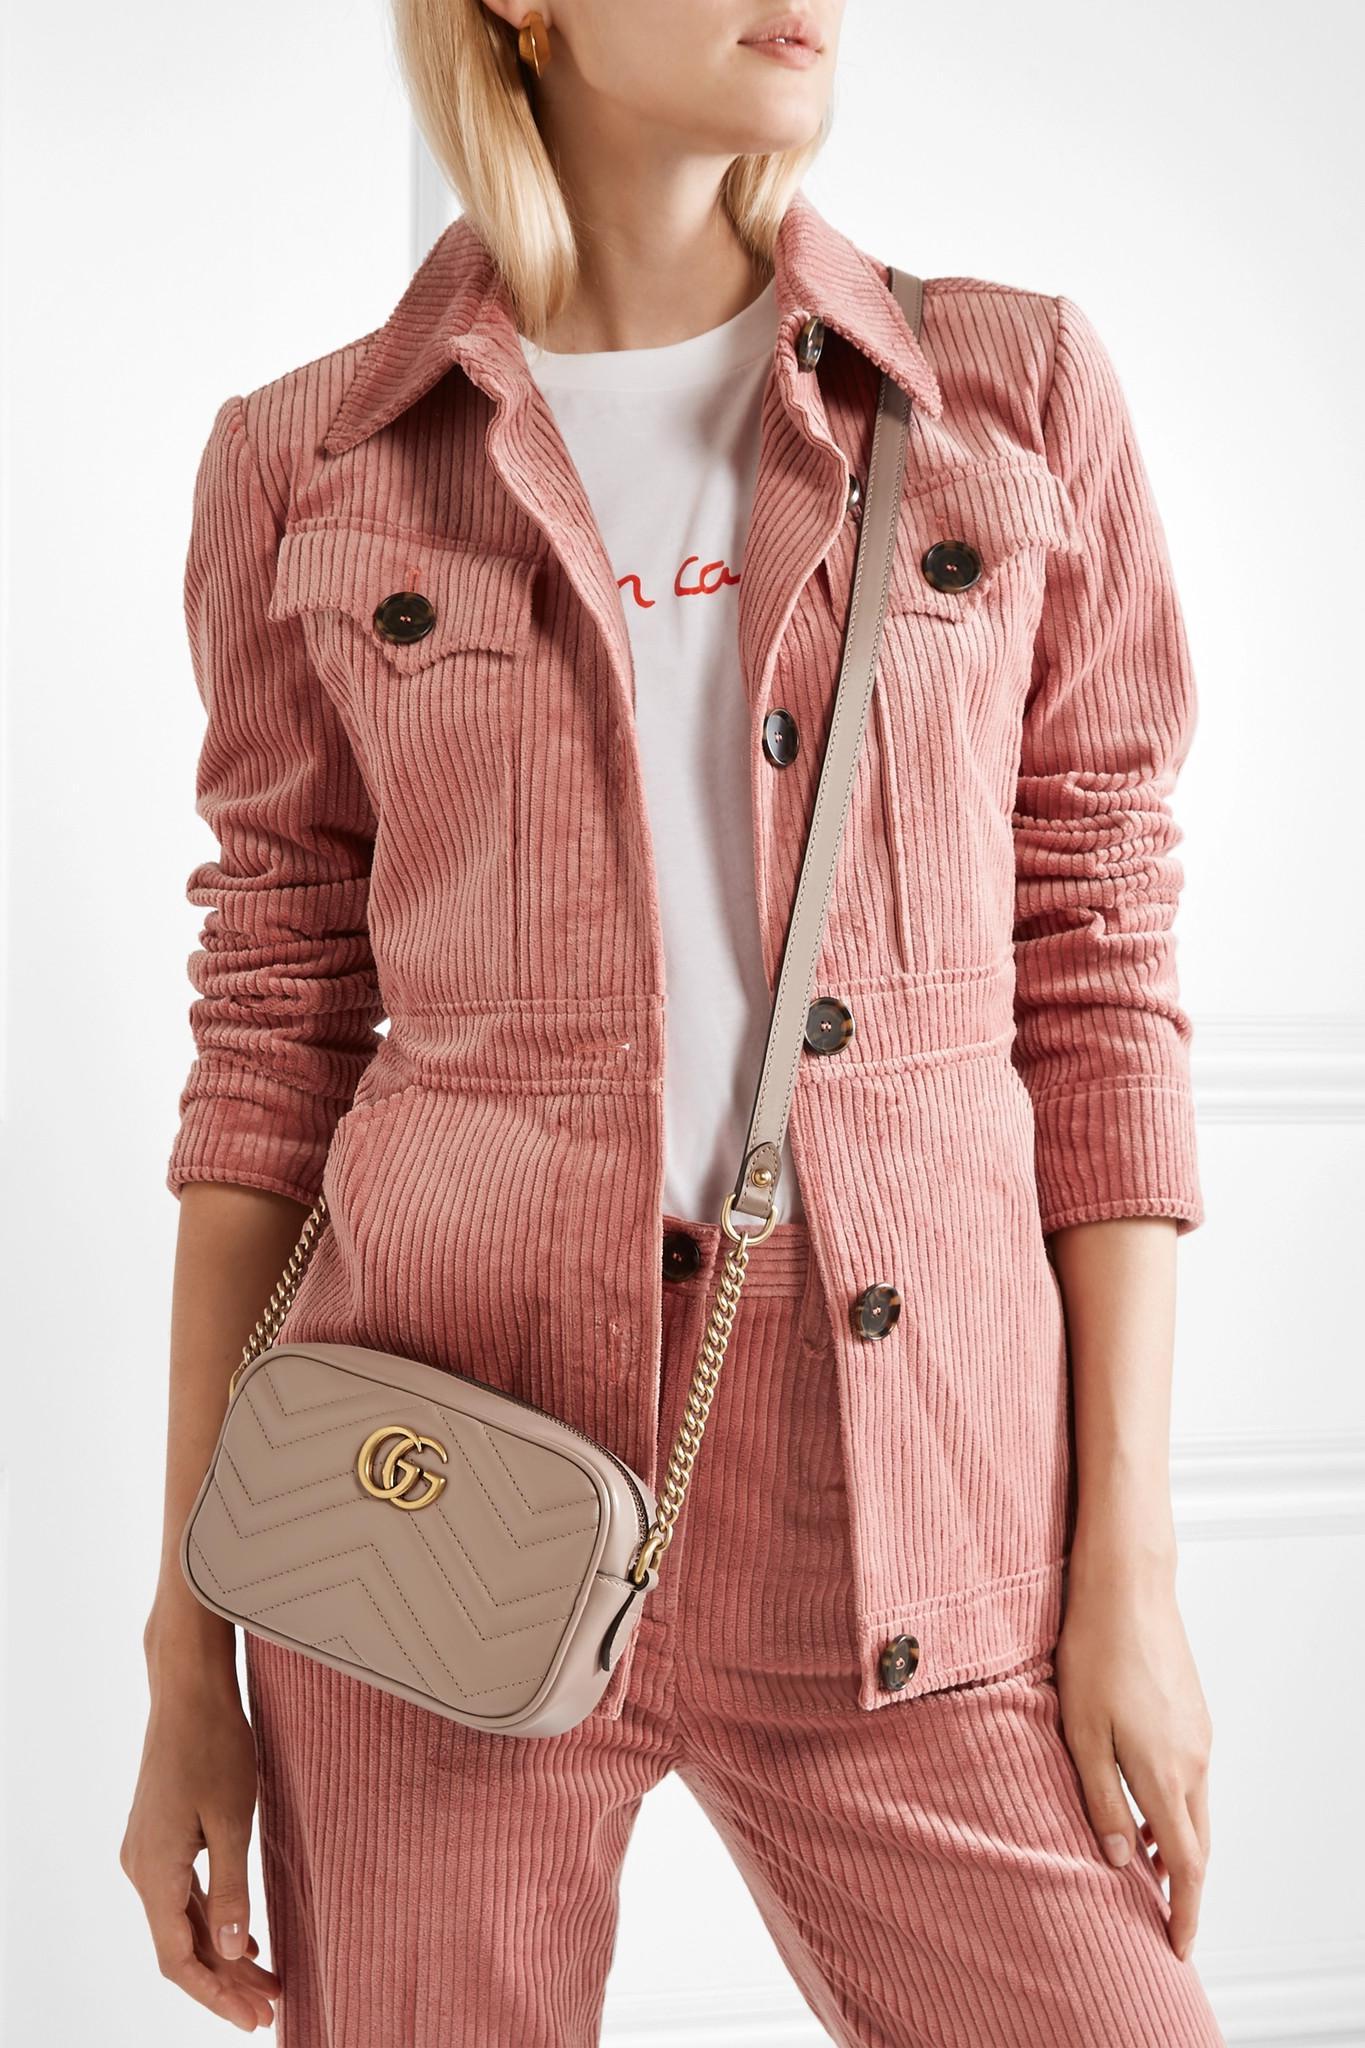 2d682d4f0e9c1d Gucci - Multicolor Gg Marmont Camera Mini Quilted Leather Shoulder Bag -  Lyst. View fullscreen